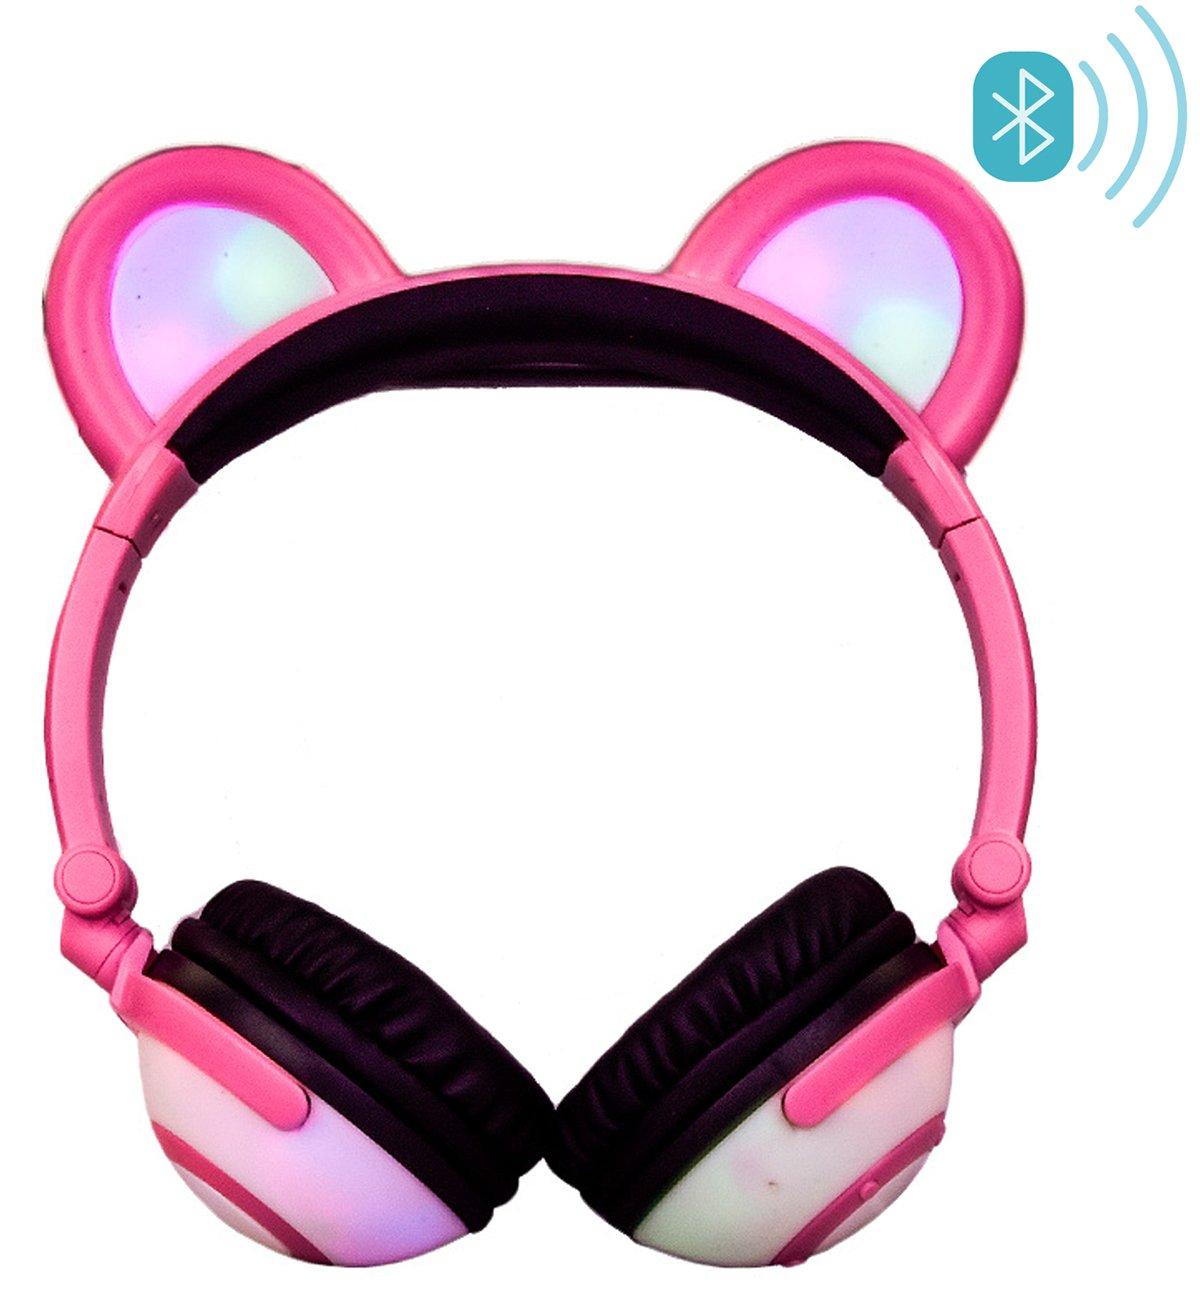 Bluetooth Wireless Headphones, LIMSON Rechargeable Foldable Kids Headset with LED Light Flashing, Anime Bear Ear Headphone BTR109(Black)